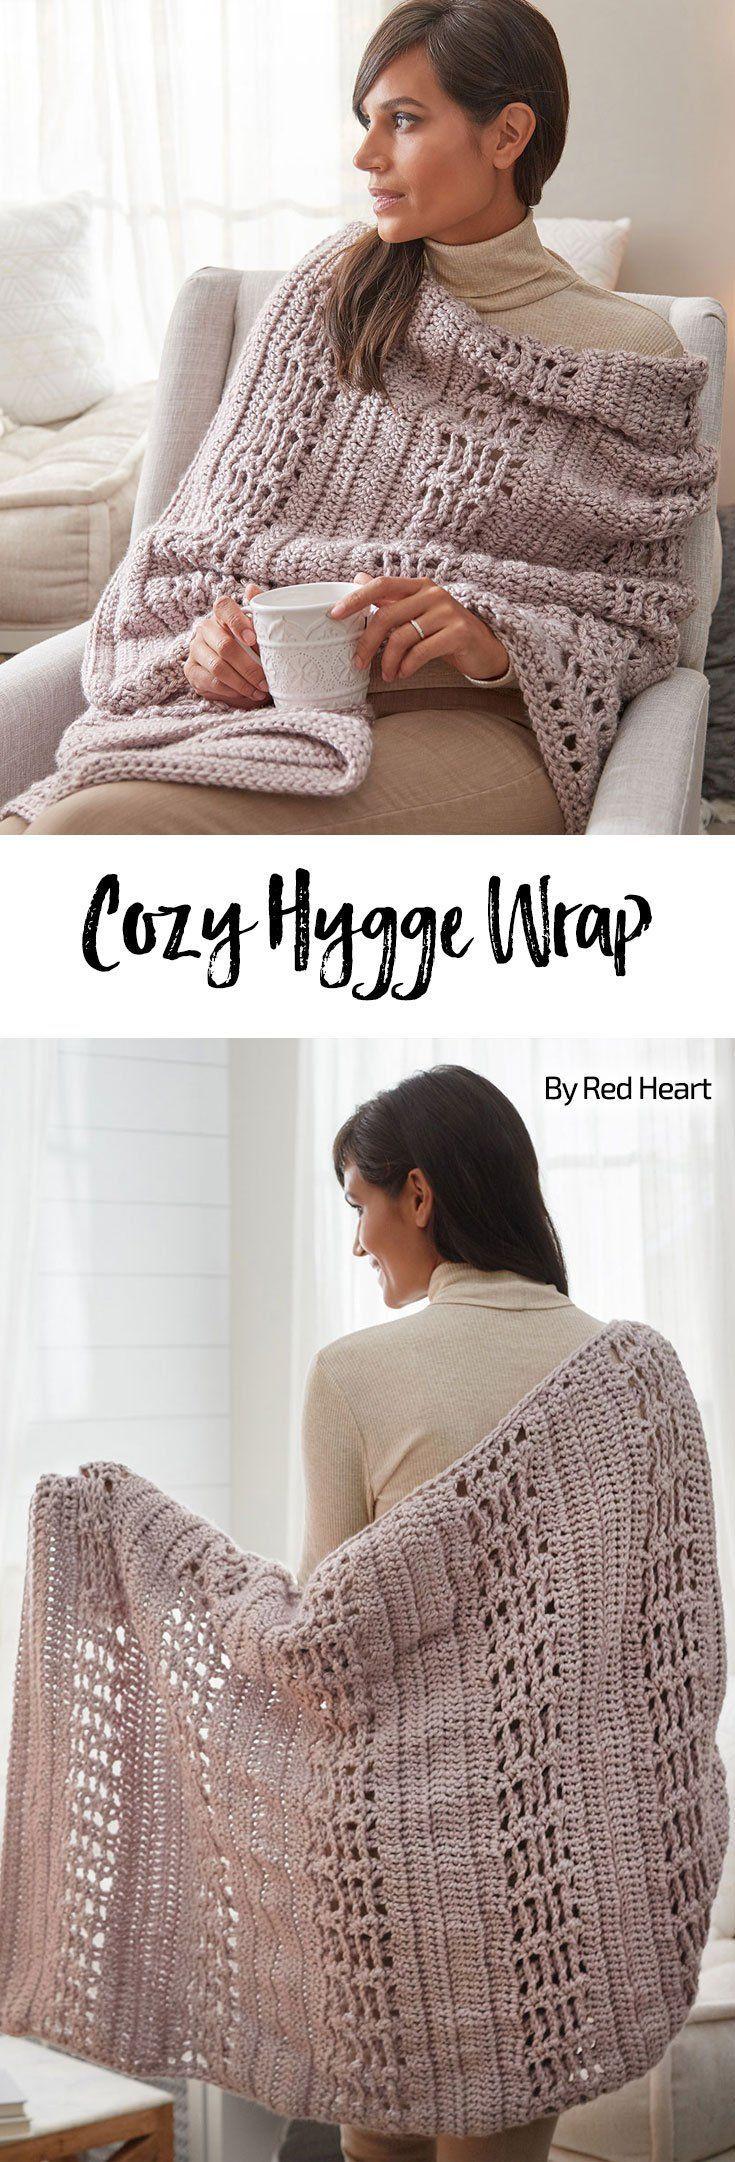 Crochet Cardigan knit handmade comfortable sweater fall night out warm winter chic cozy oversized modern custom soft striped